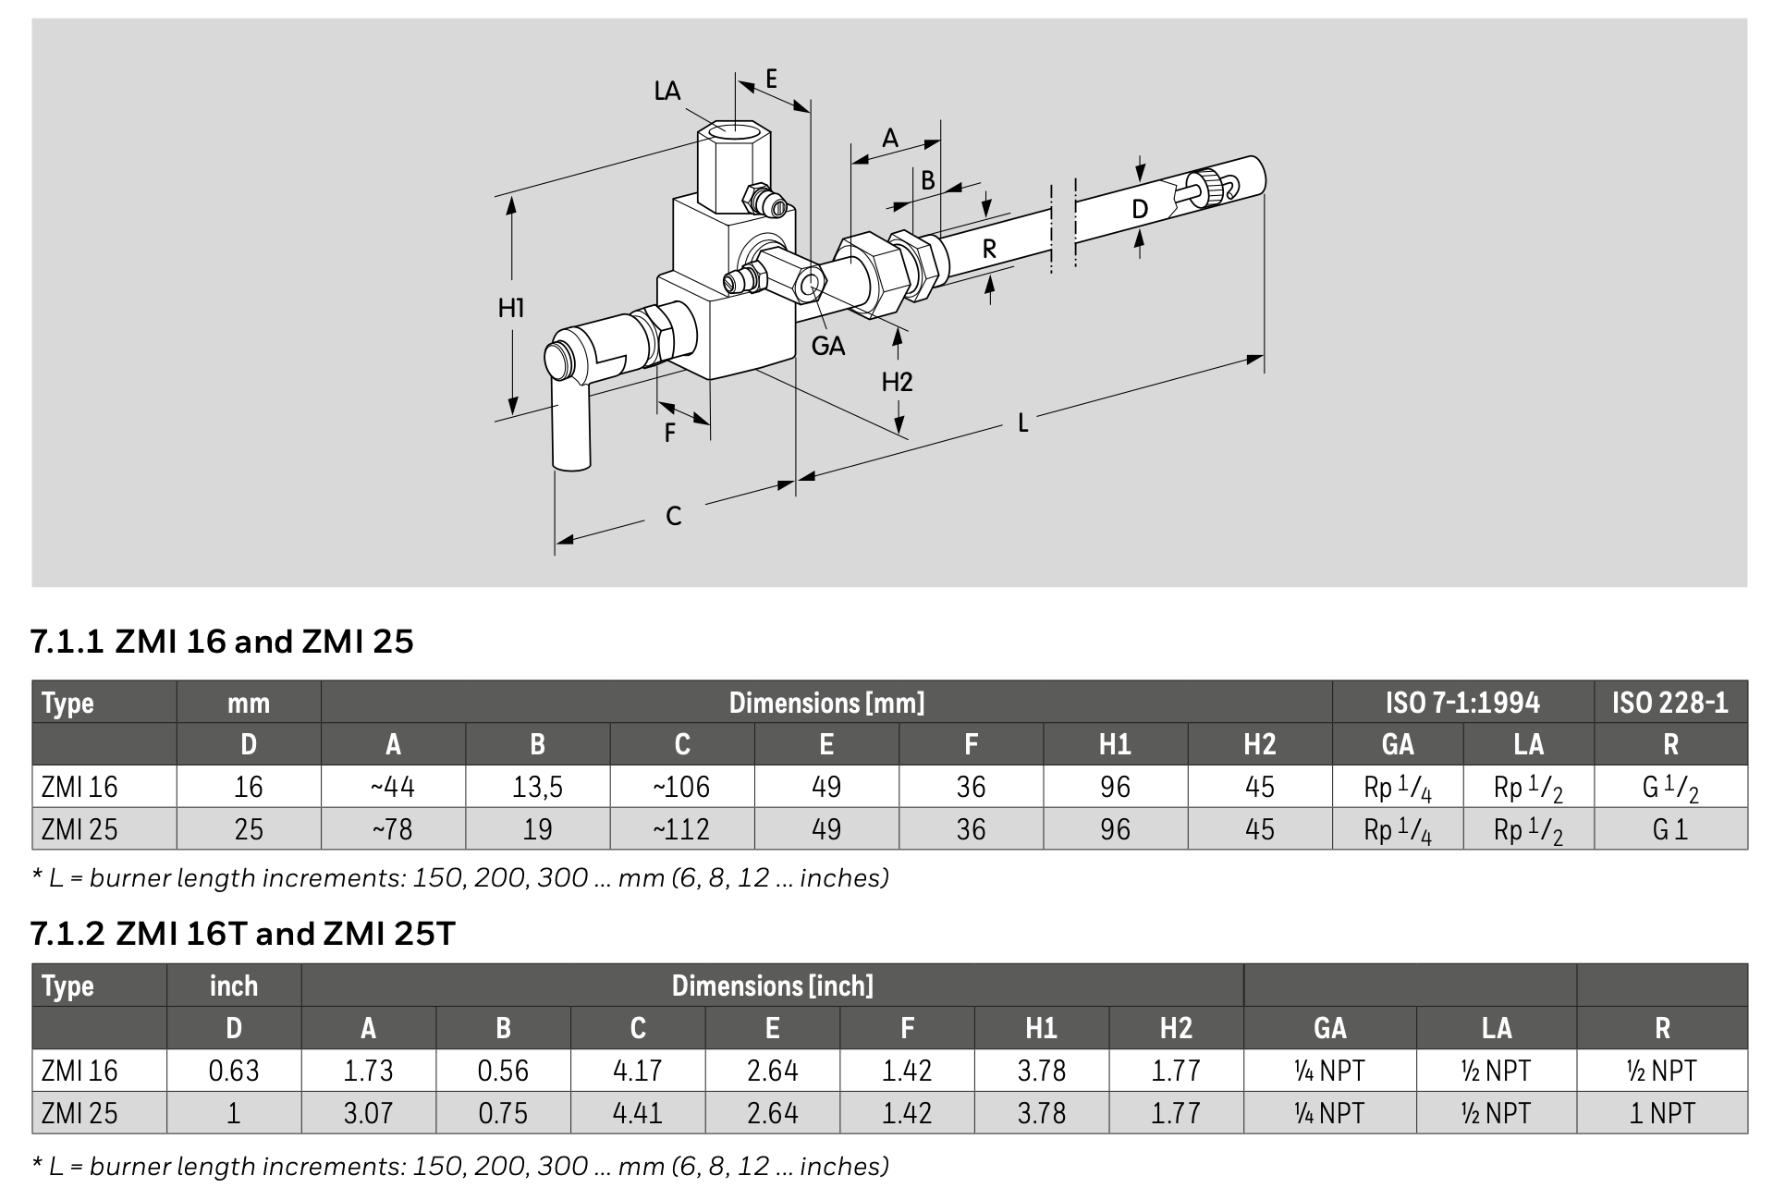 Krom Schroder Ionization pilot burner dimensions